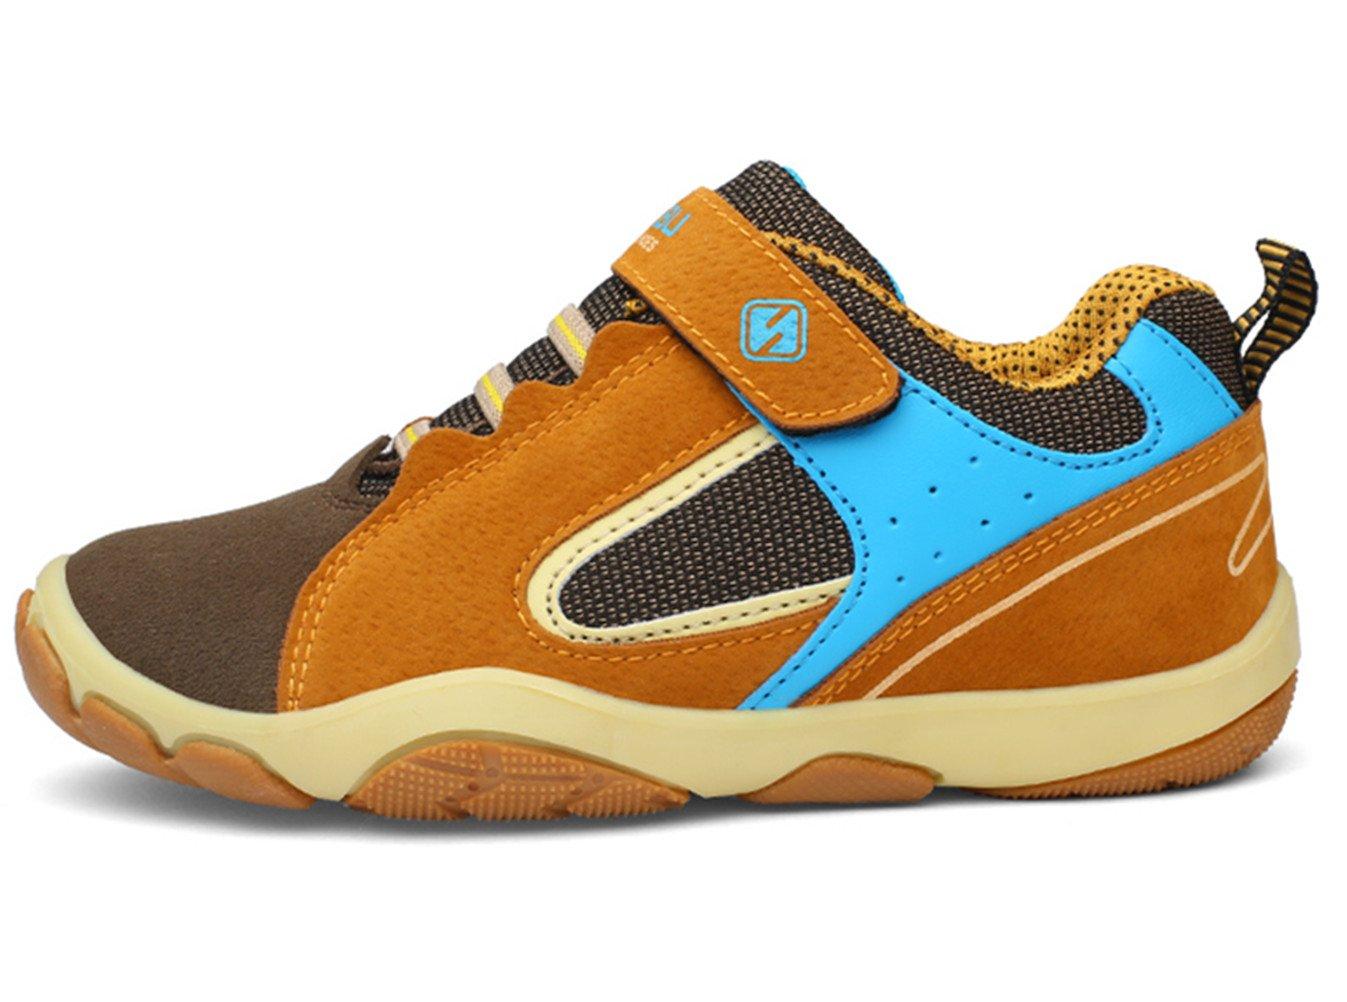 DADAWEN Kid's Outdoor Hiking Athletic Sneakers Strap Trail Running Shoes (Toddler/Little Kid/Big Kid) Brown US Size 5 M Big Kid by DADAWEN (Image #3)